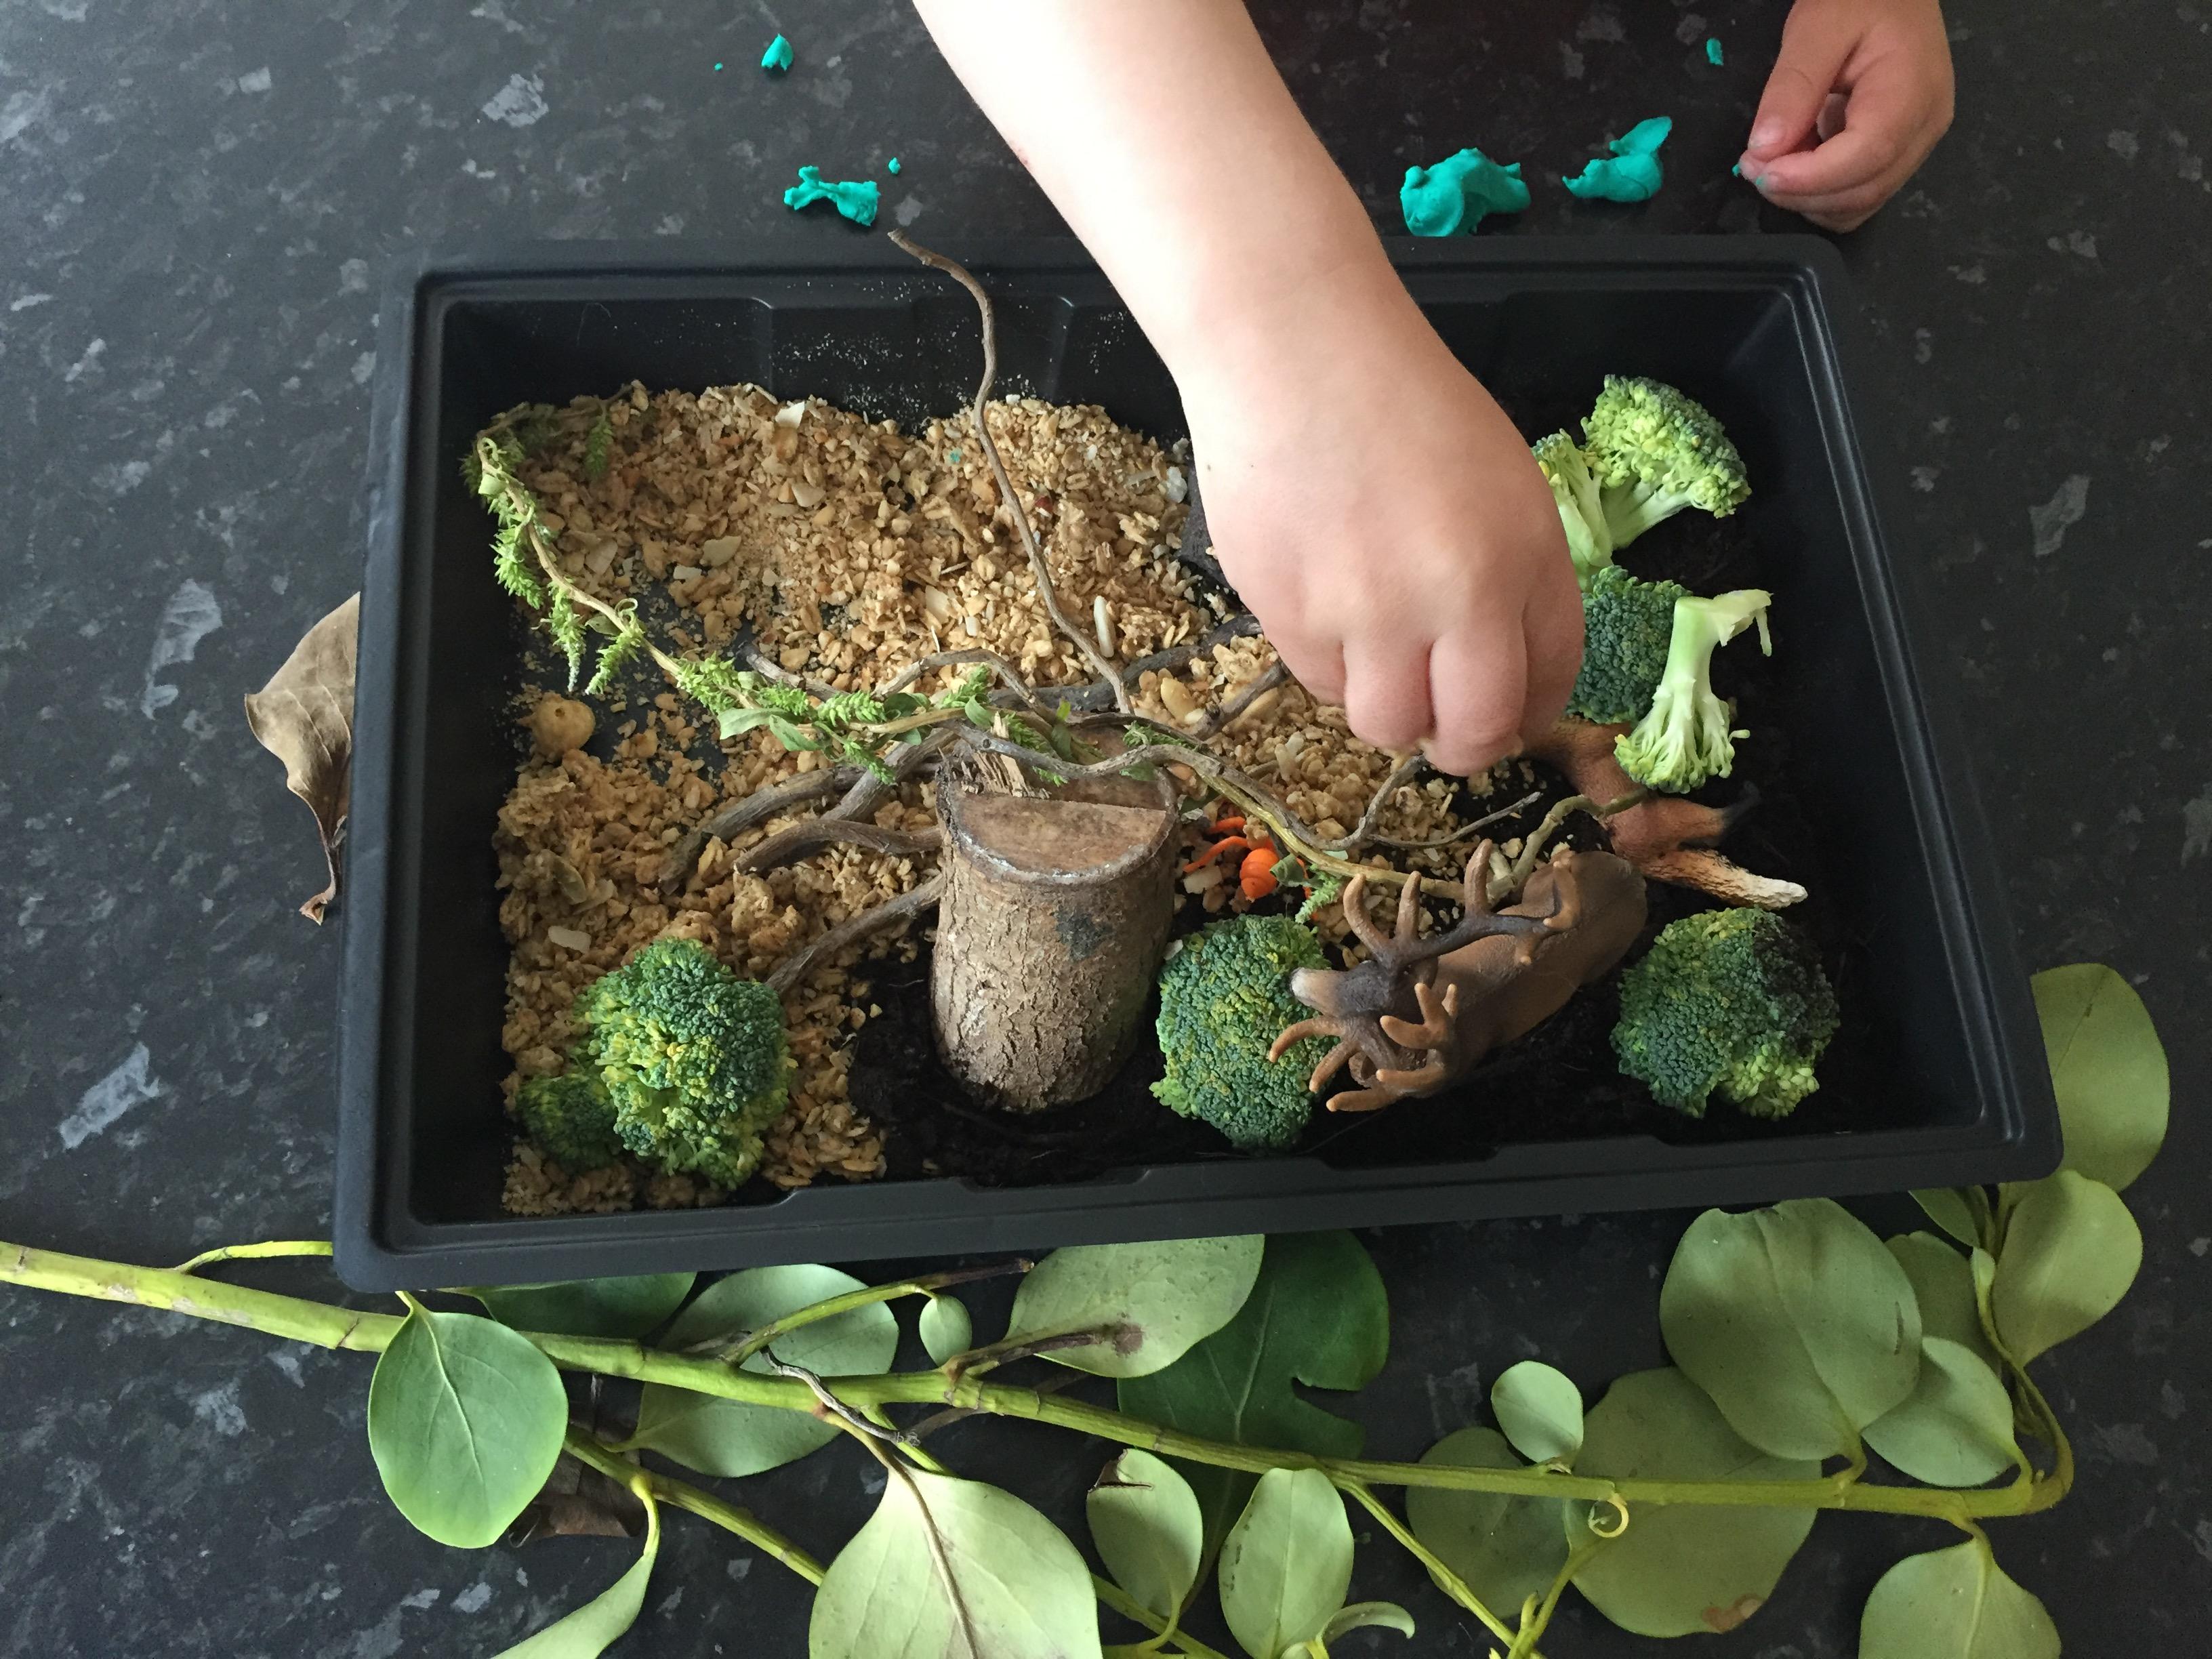 forest sensory STEM play set using schleich forest dweller figures